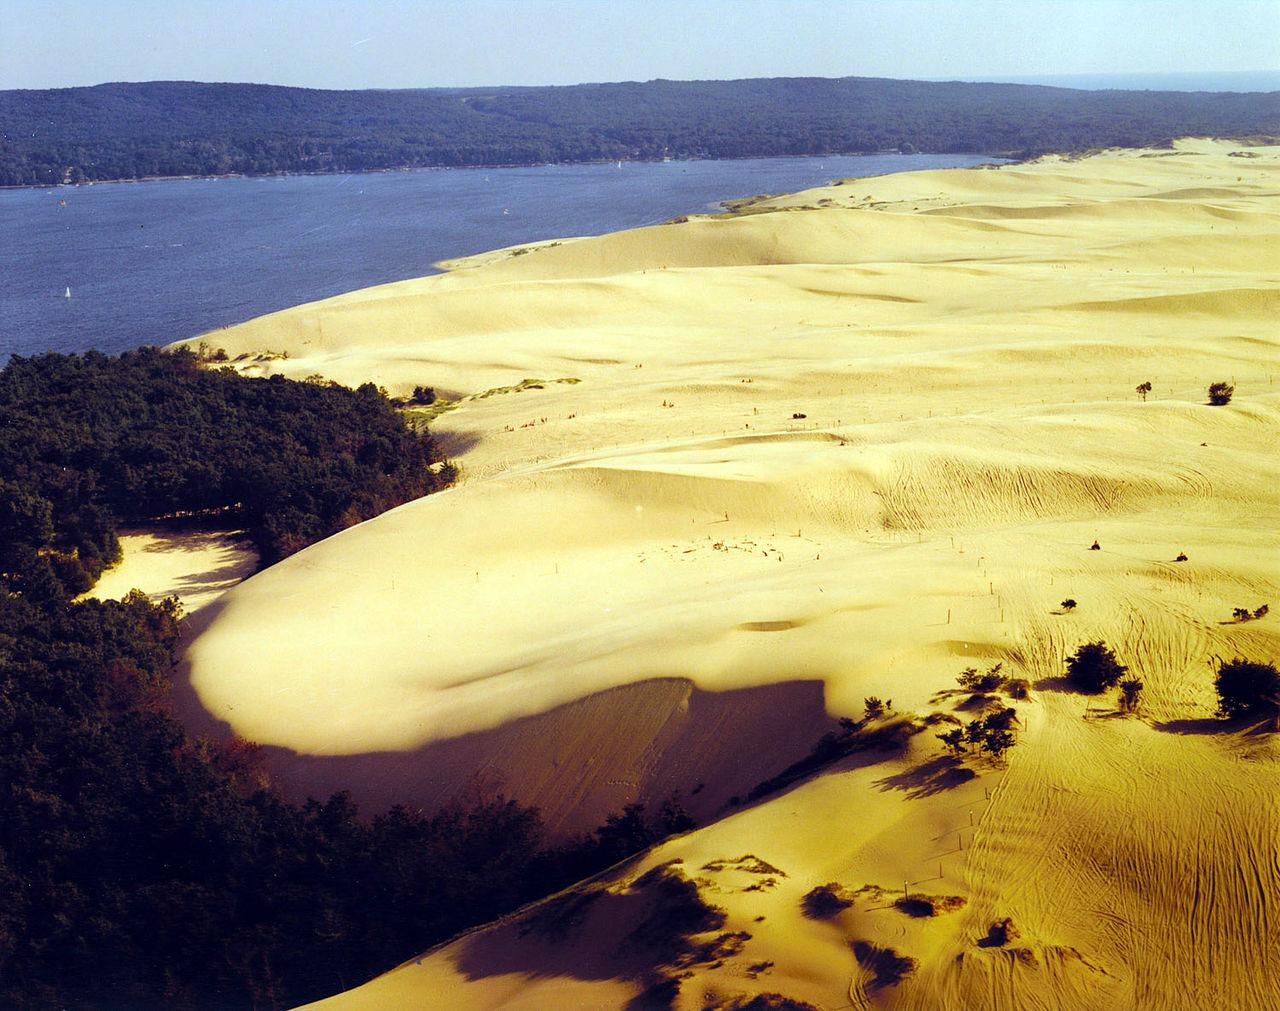 Popular Beach of Michigan-The Beach of Silver Lake Sand Dunes